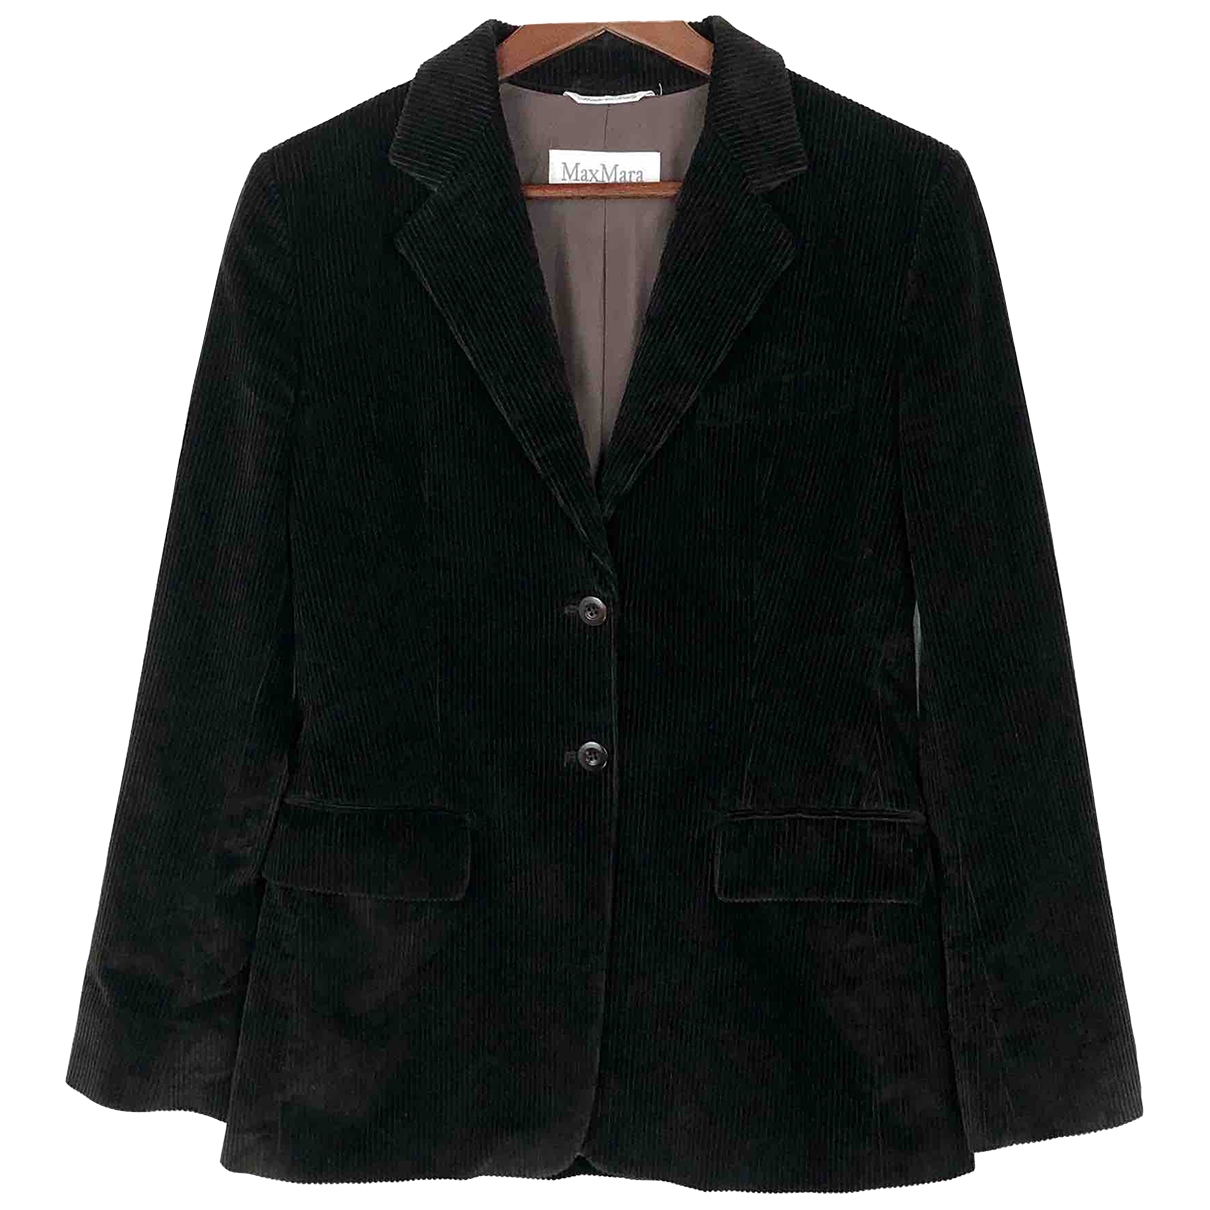 Max Mara \N Black Cotton jacket for Women 6 US